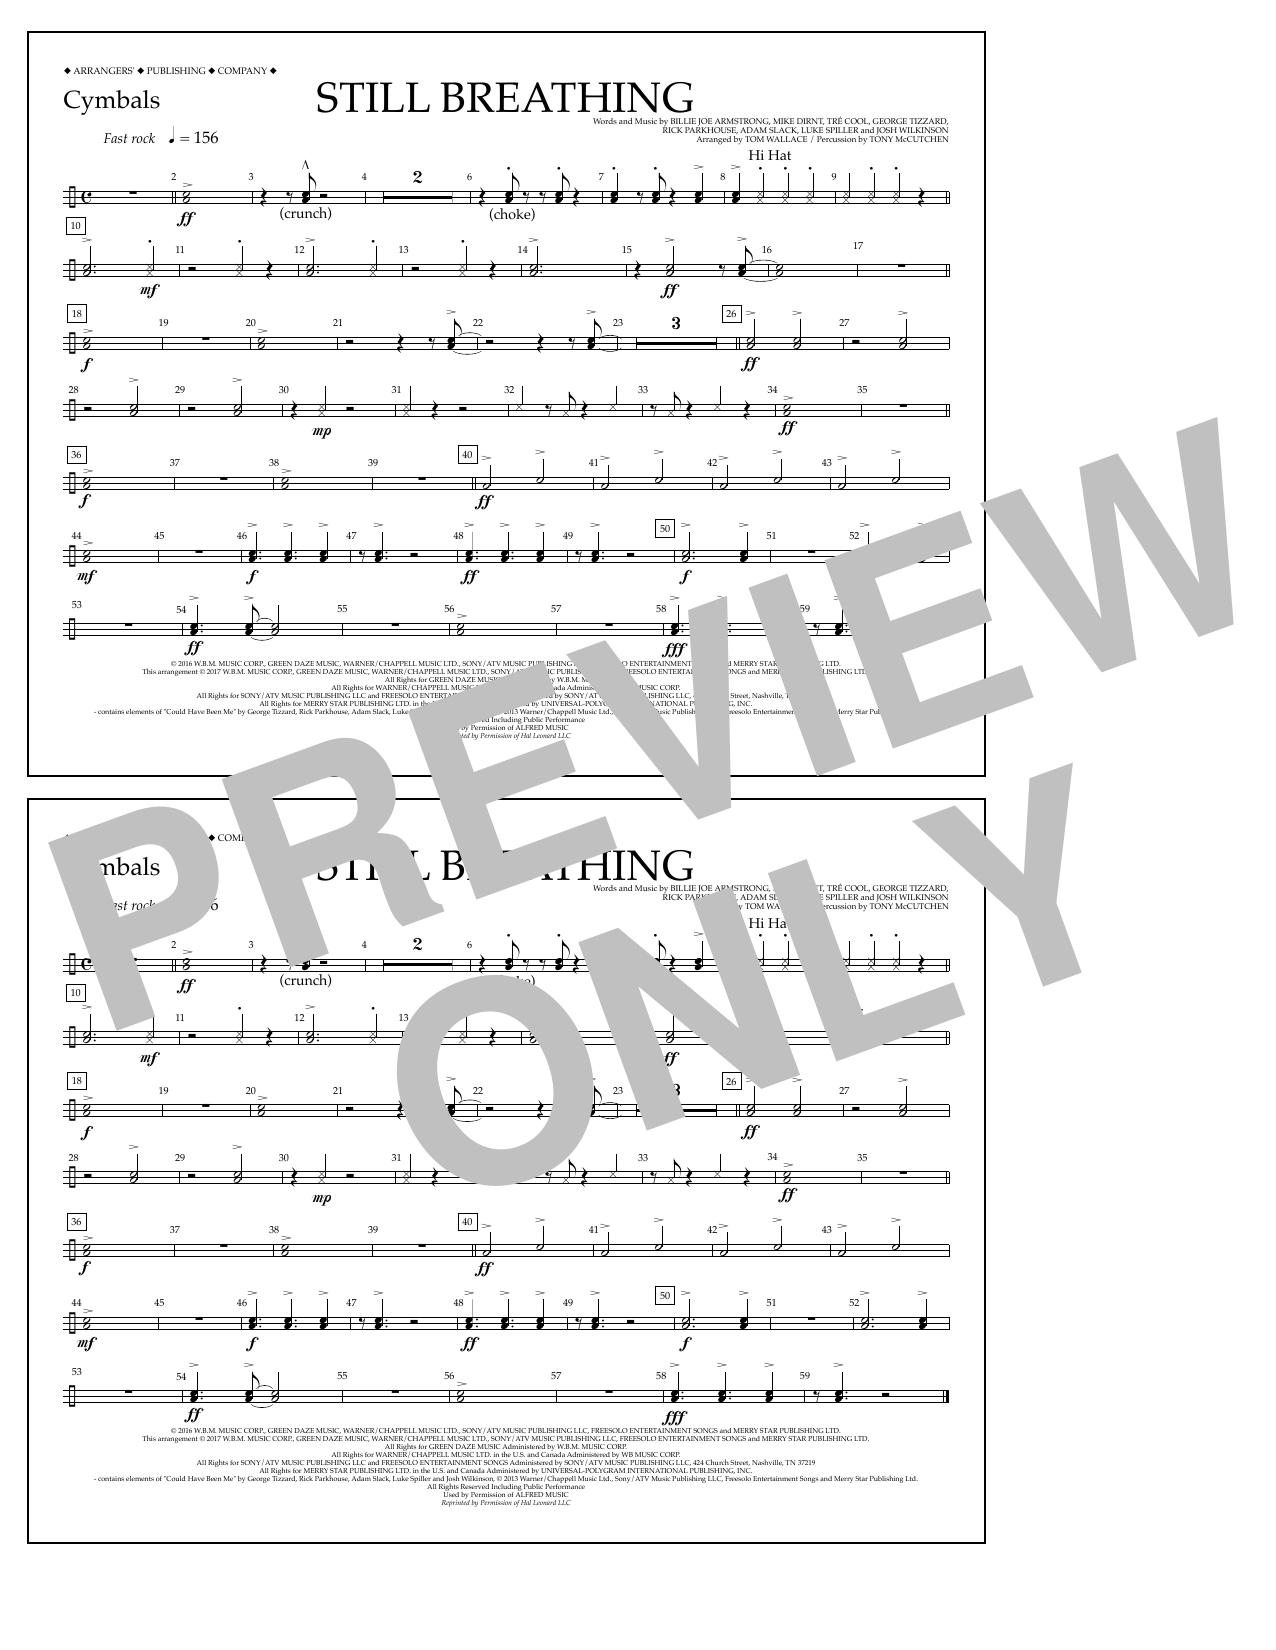 Still Breathing - Cymbals Sheet Music